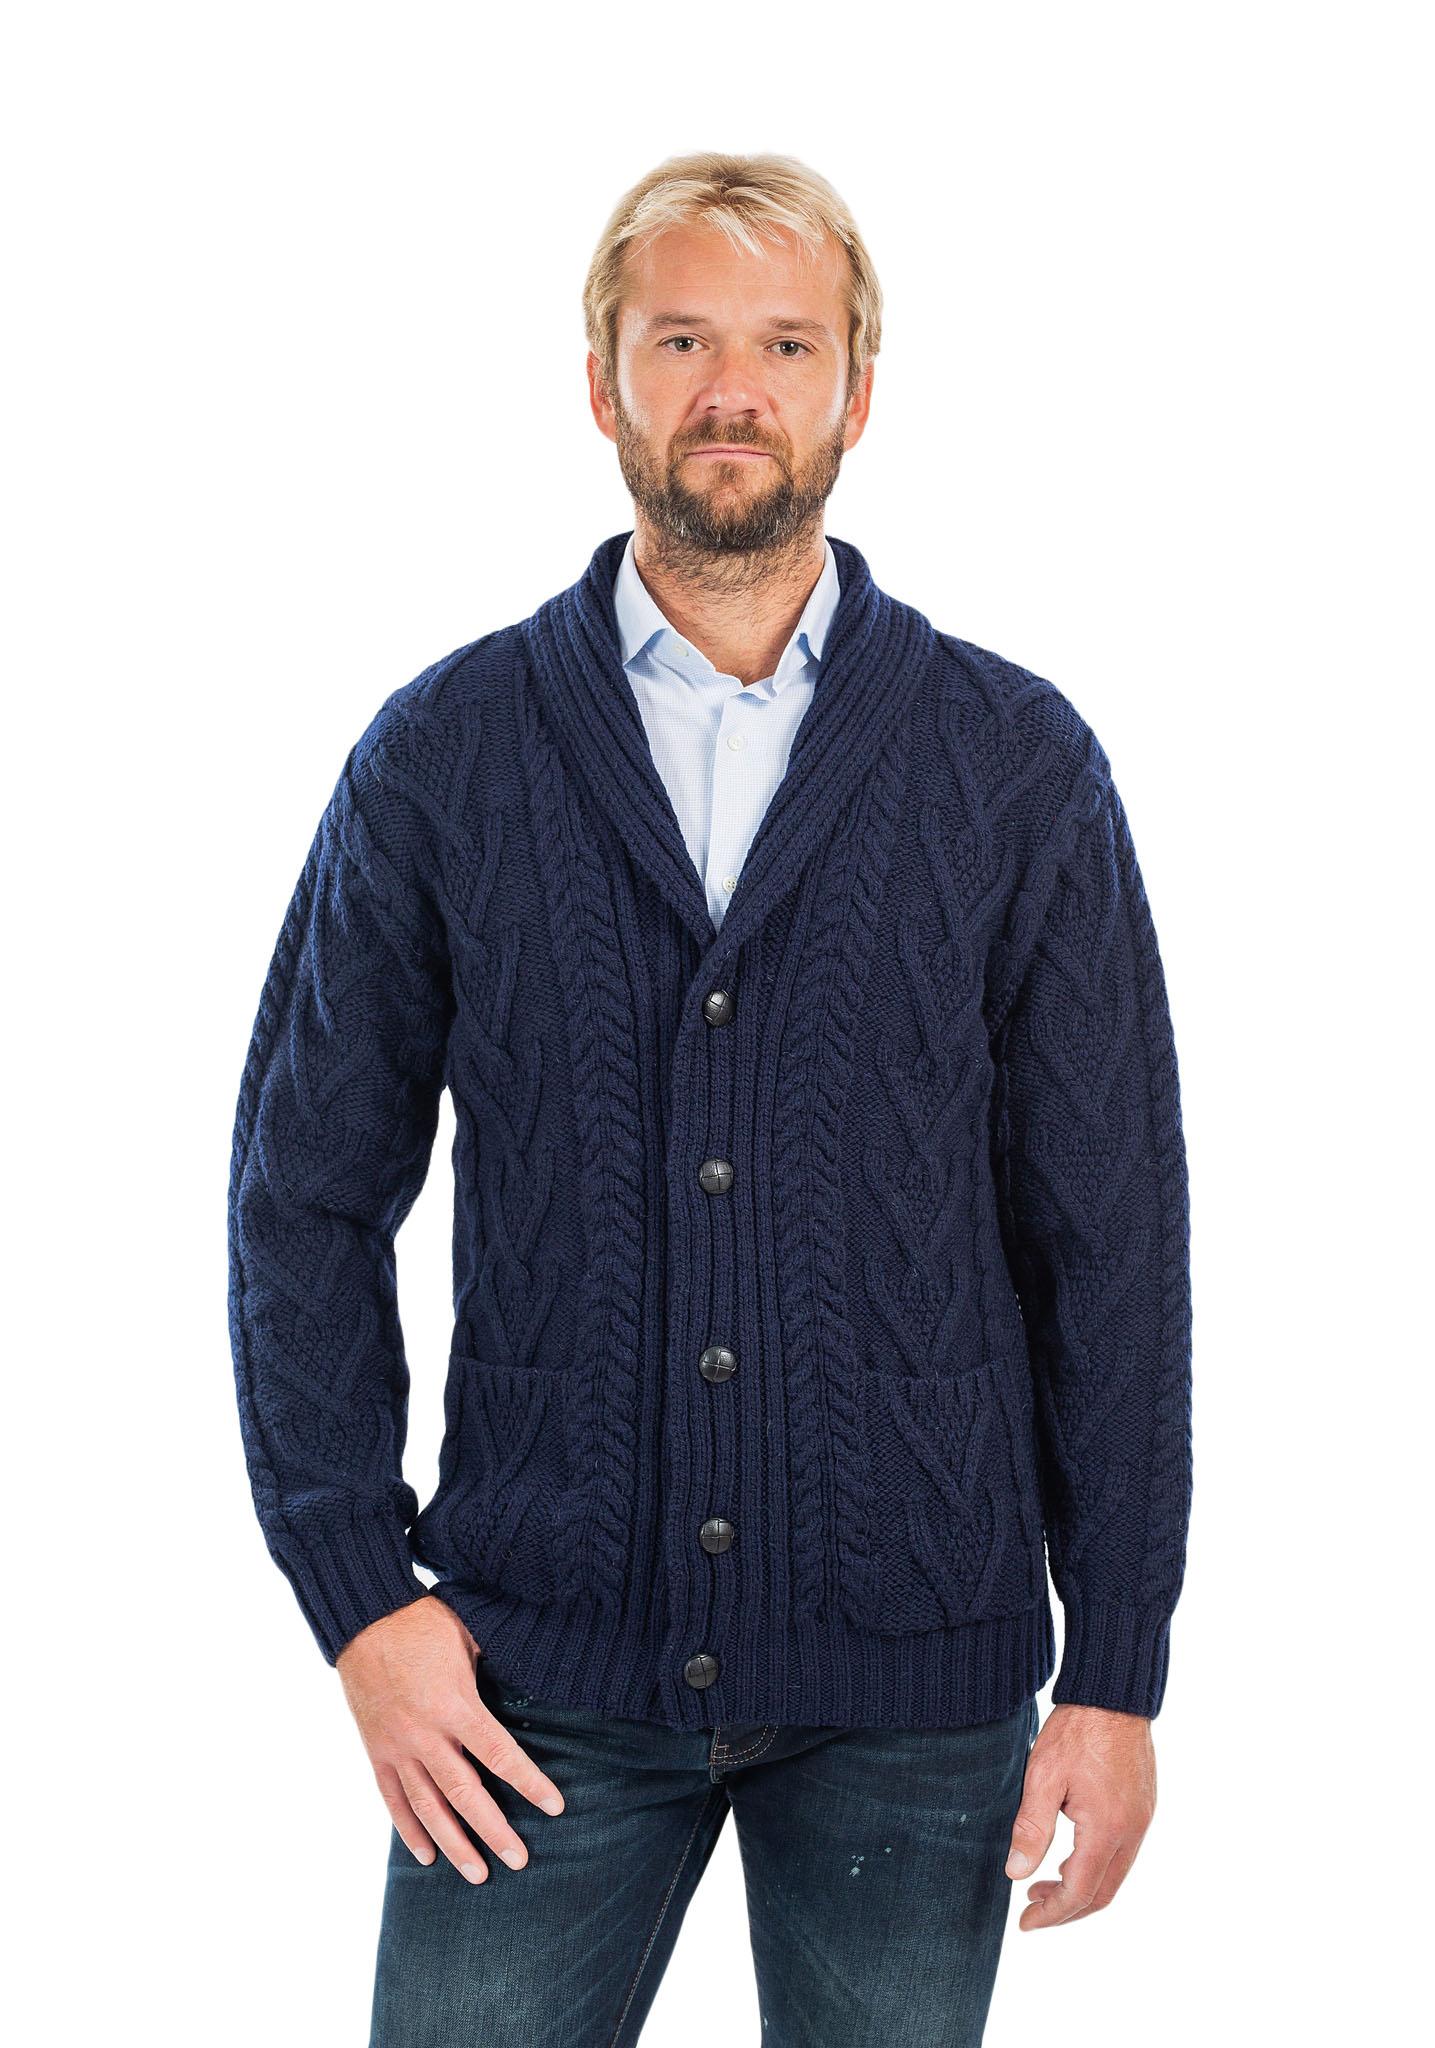 SAOL-Mens-Irish-Merino-Wool-Cardigan-Shawl-Collar-Front-Pockets-Aran-Cable-Knit thumbnail 20